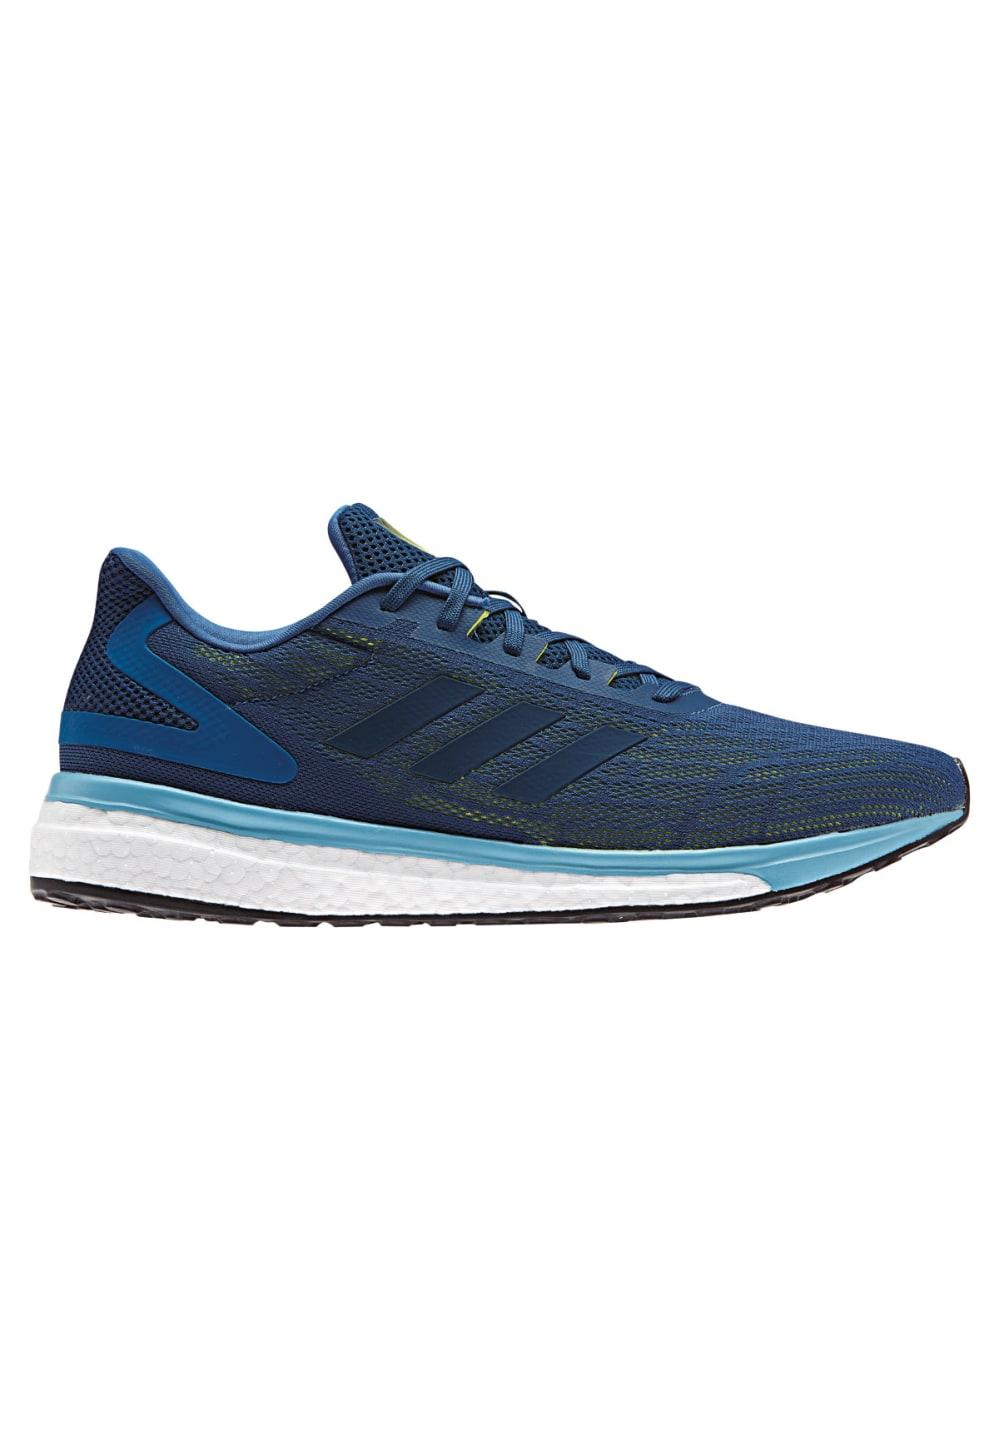 Adidas Response Lite Hommes Chaussures running